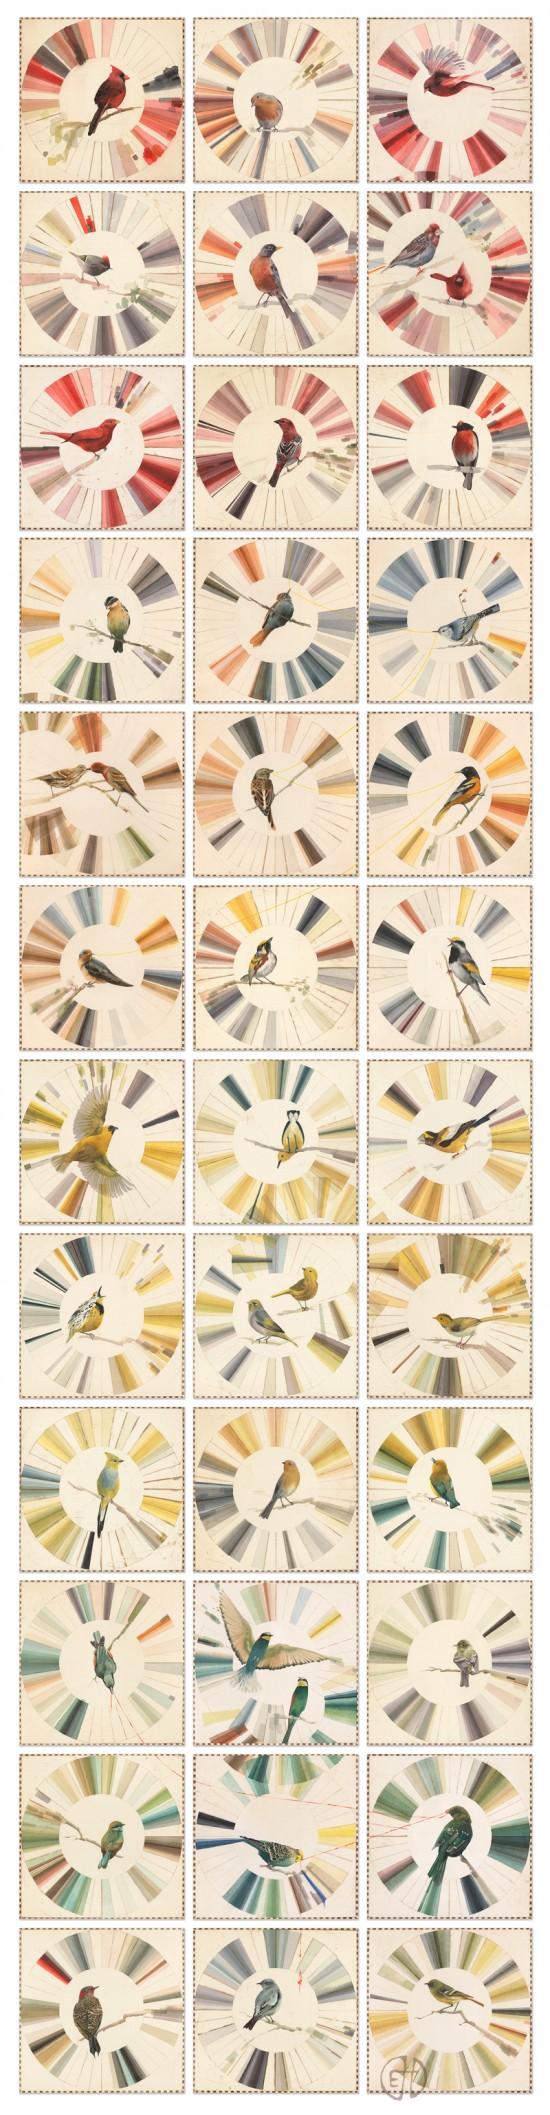 Heck_BirdwatchingThroughSpectroscopicLenses